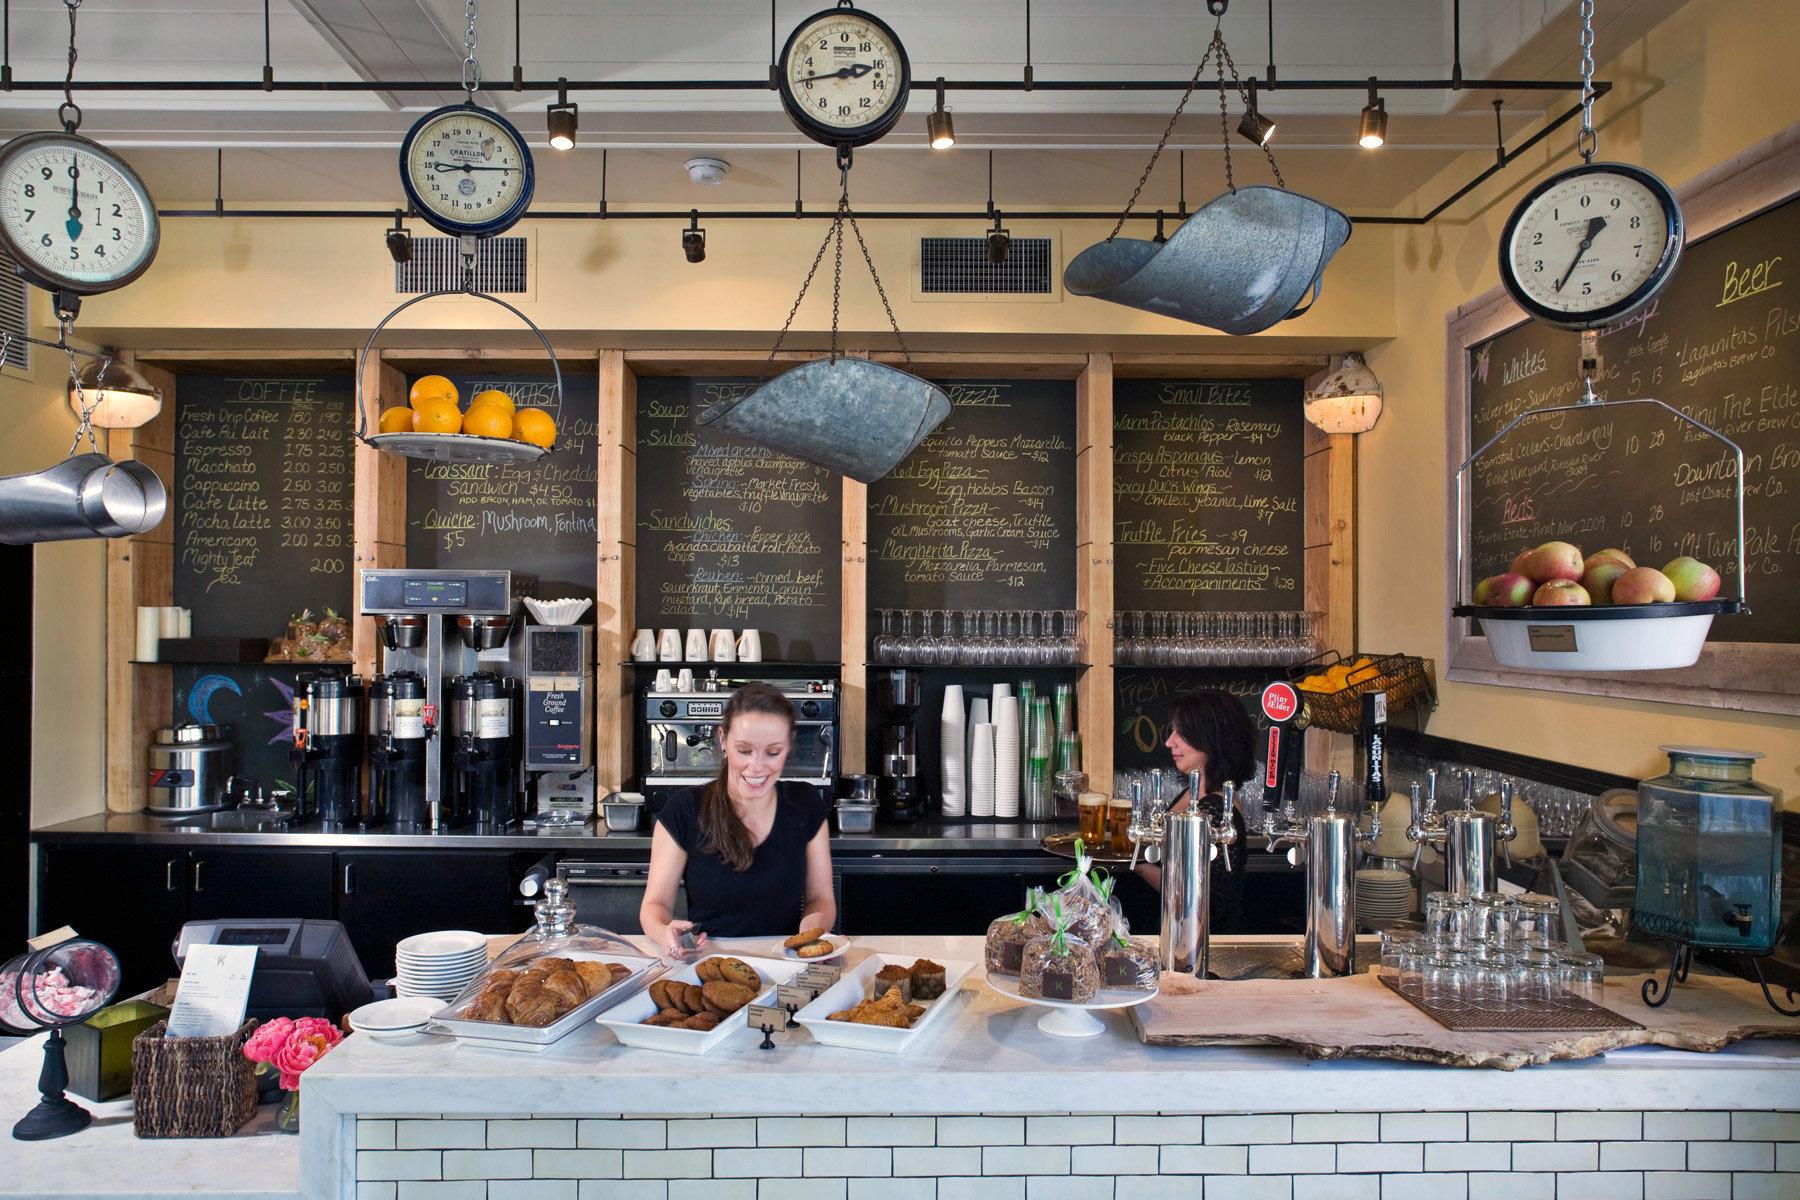 Boutique Dining Eat restaurant brunch Bar sense bakery